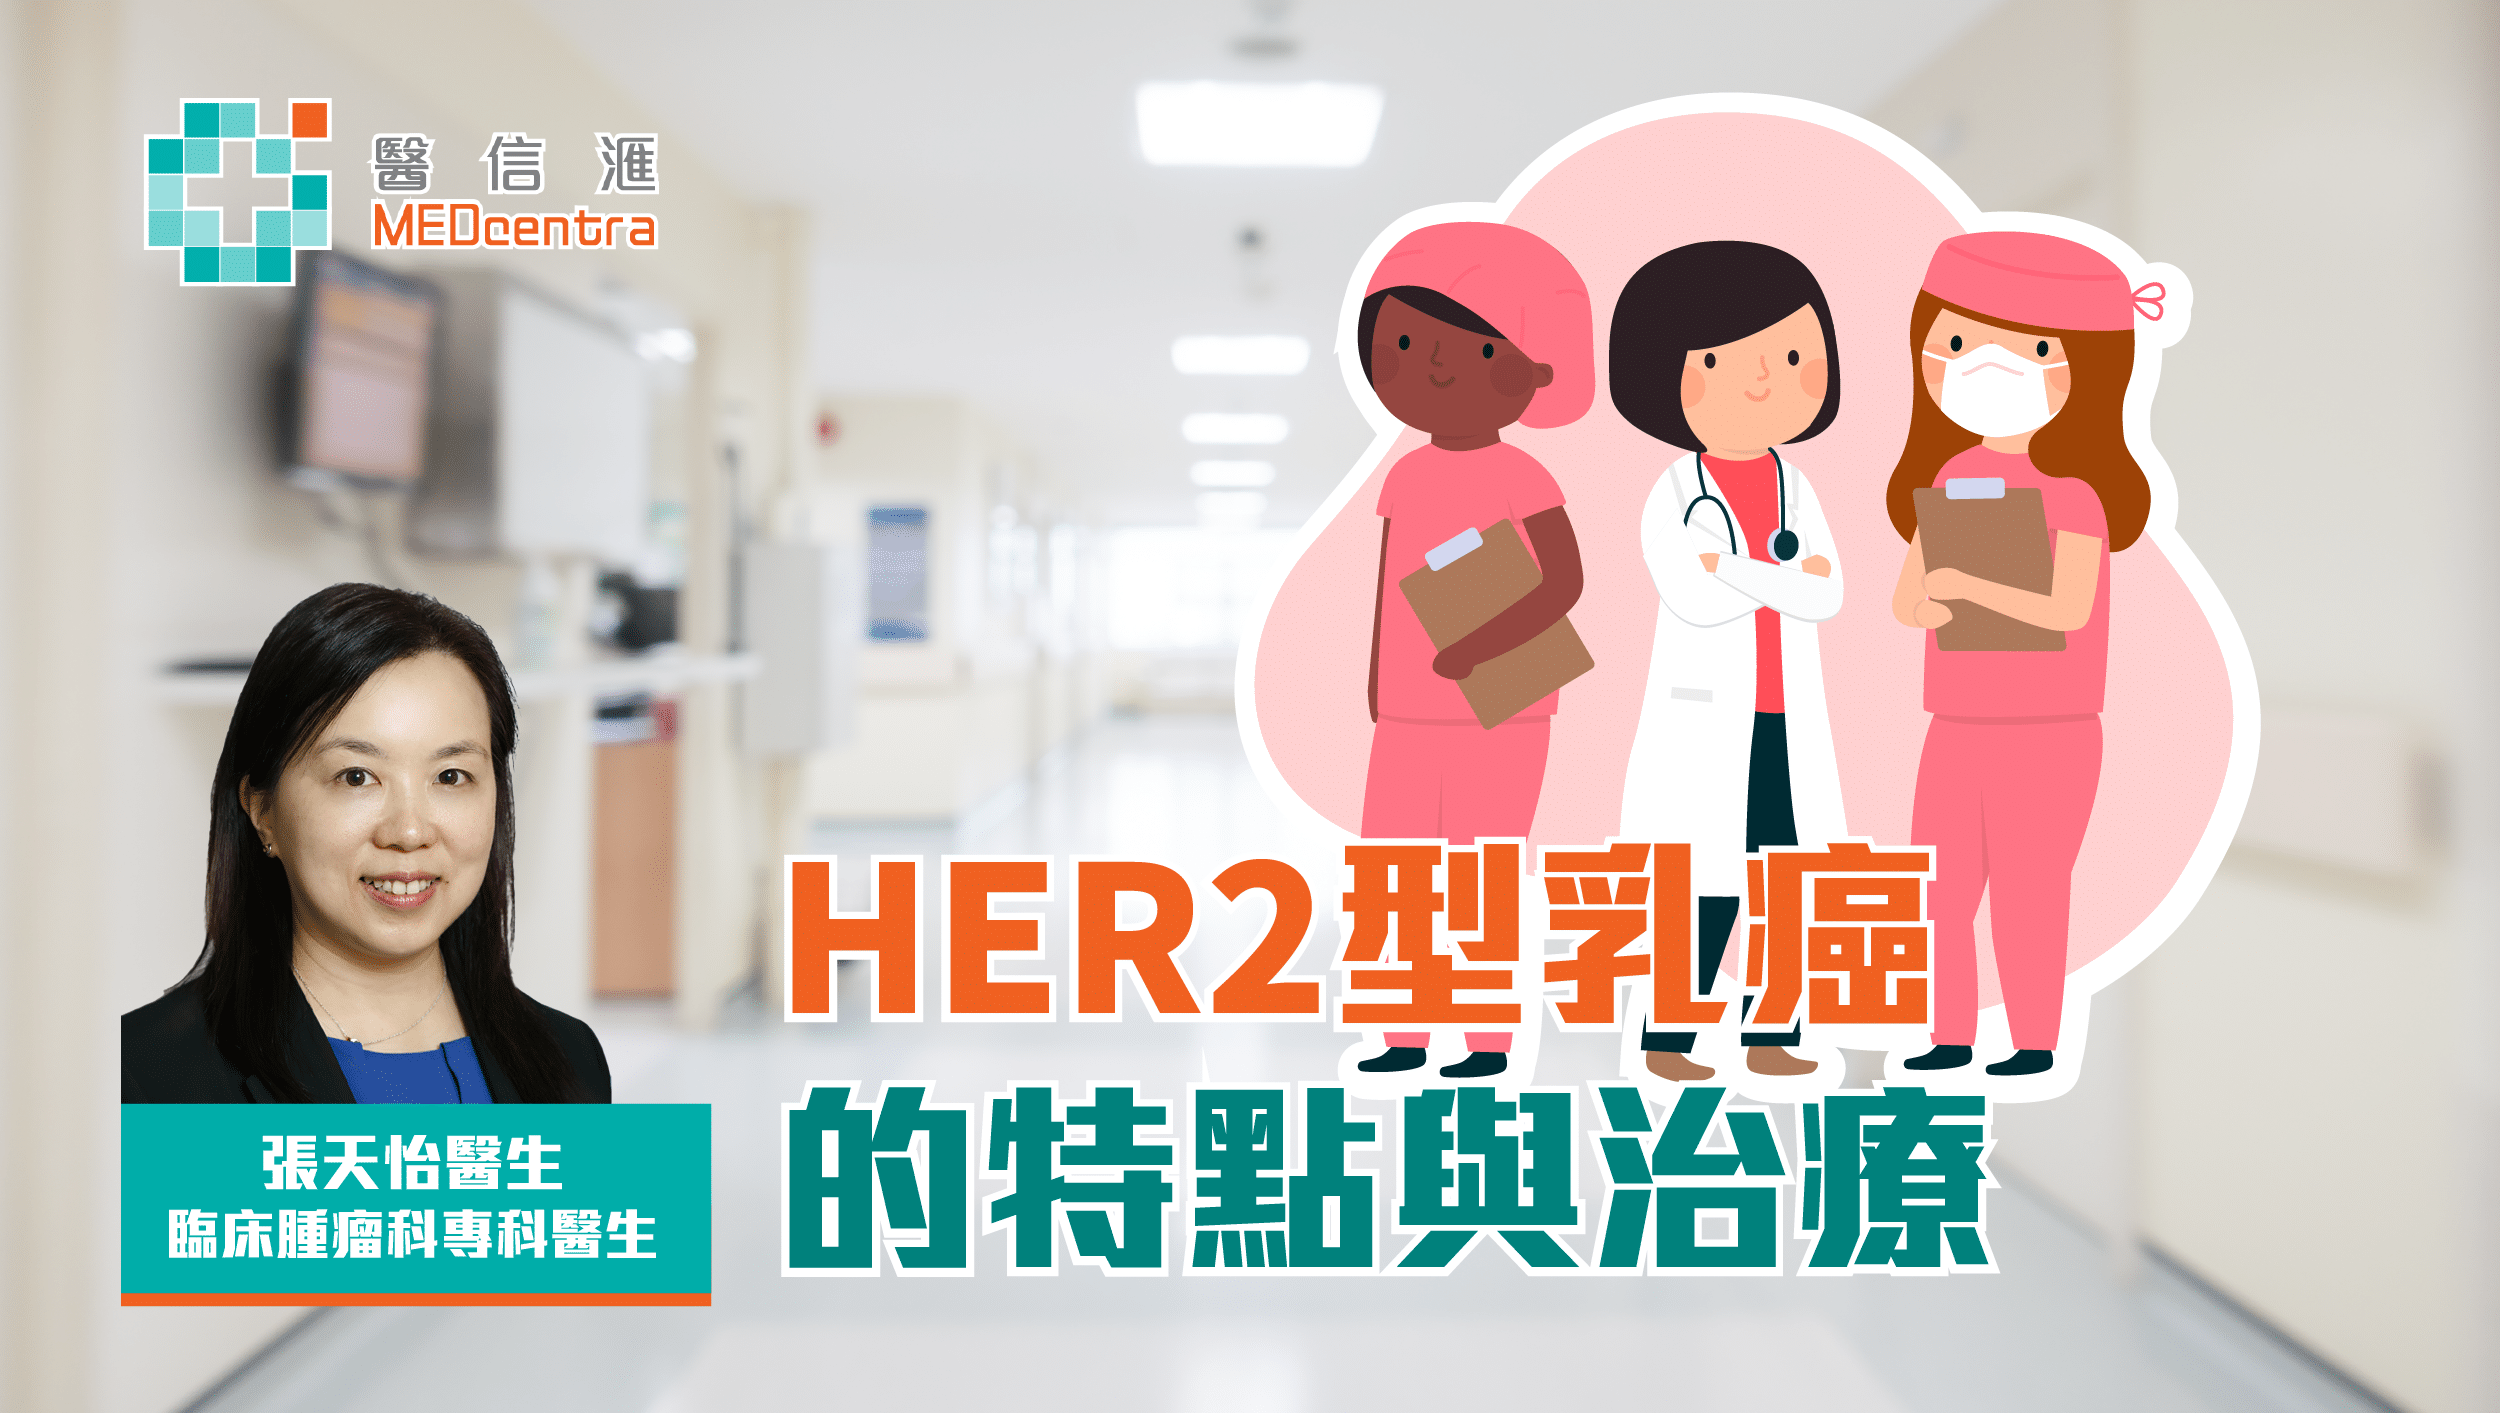 HER2型乳癌的特點與治療   張天怡醫生